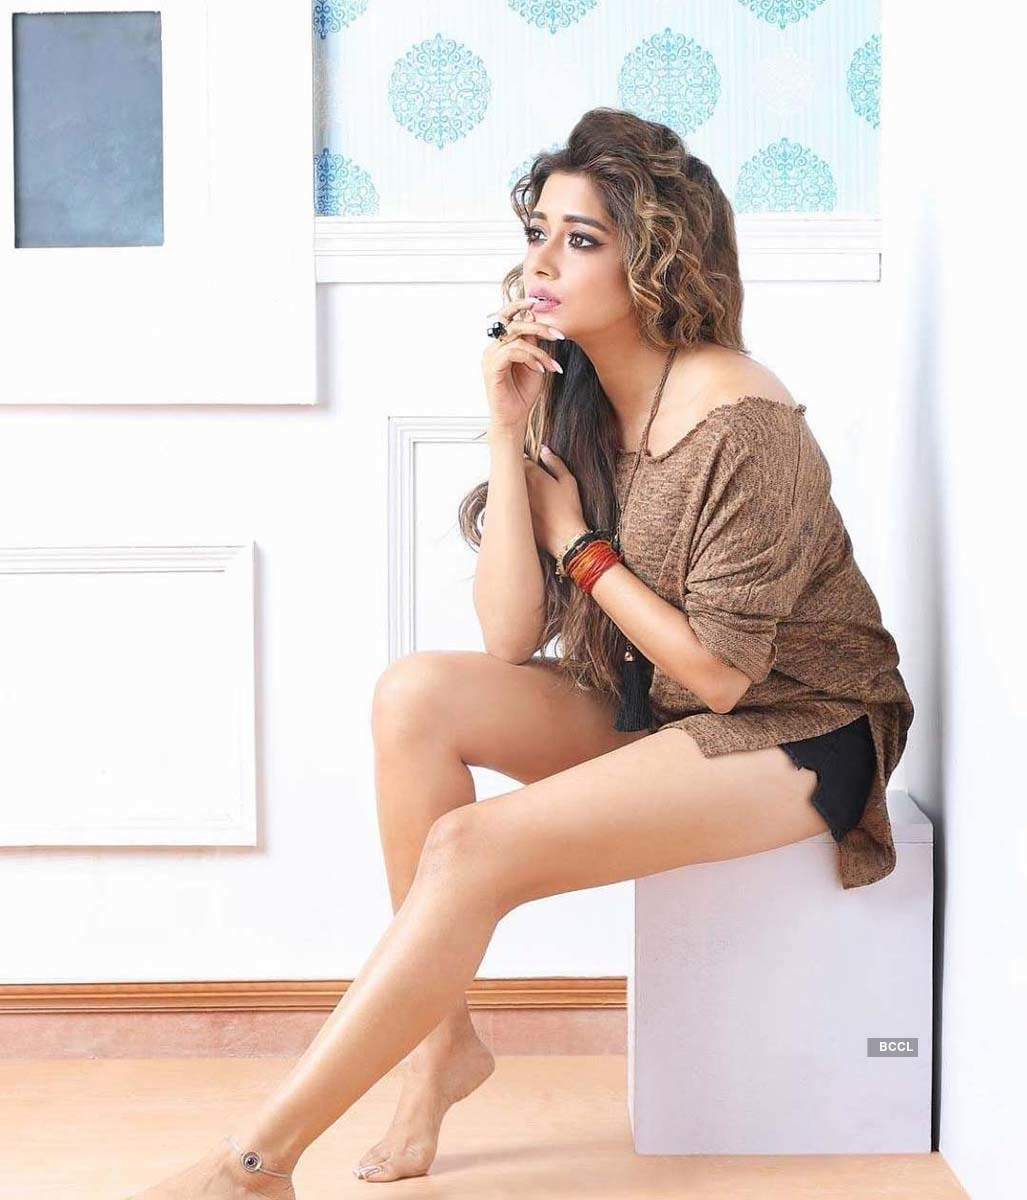 Tina Datta of 'Uttaran' ditches her girl next door image in these bold photos